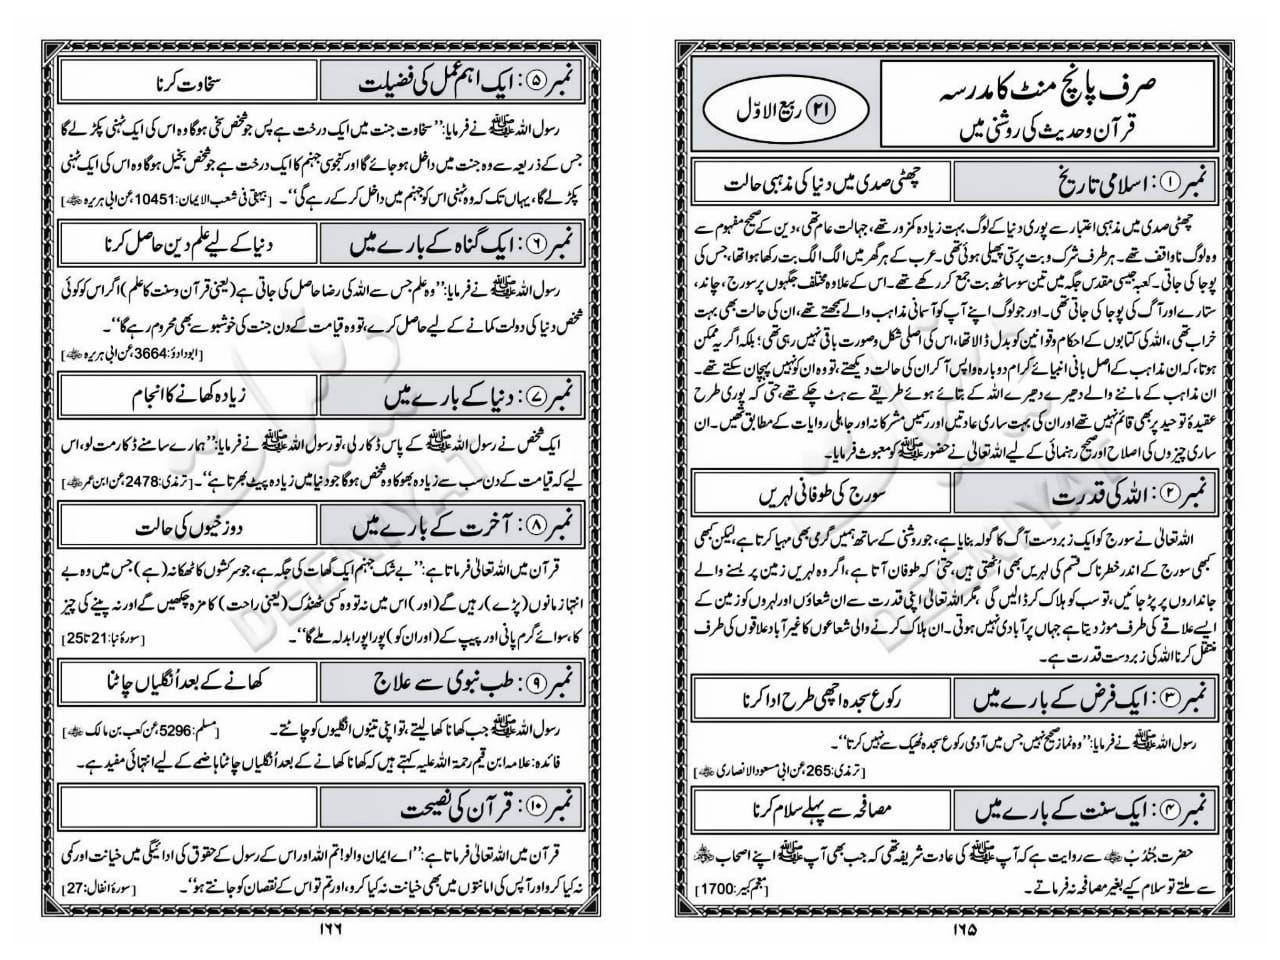 5 Minutes Ka Madarsa 21 Rabi Ul Awwal1440 Hijri 19 Nov 2019 Assalaamu Alaikum Wa Rahmatullaahi Wa Barakaa Islamic Information Islamic Messages Pretty Journals